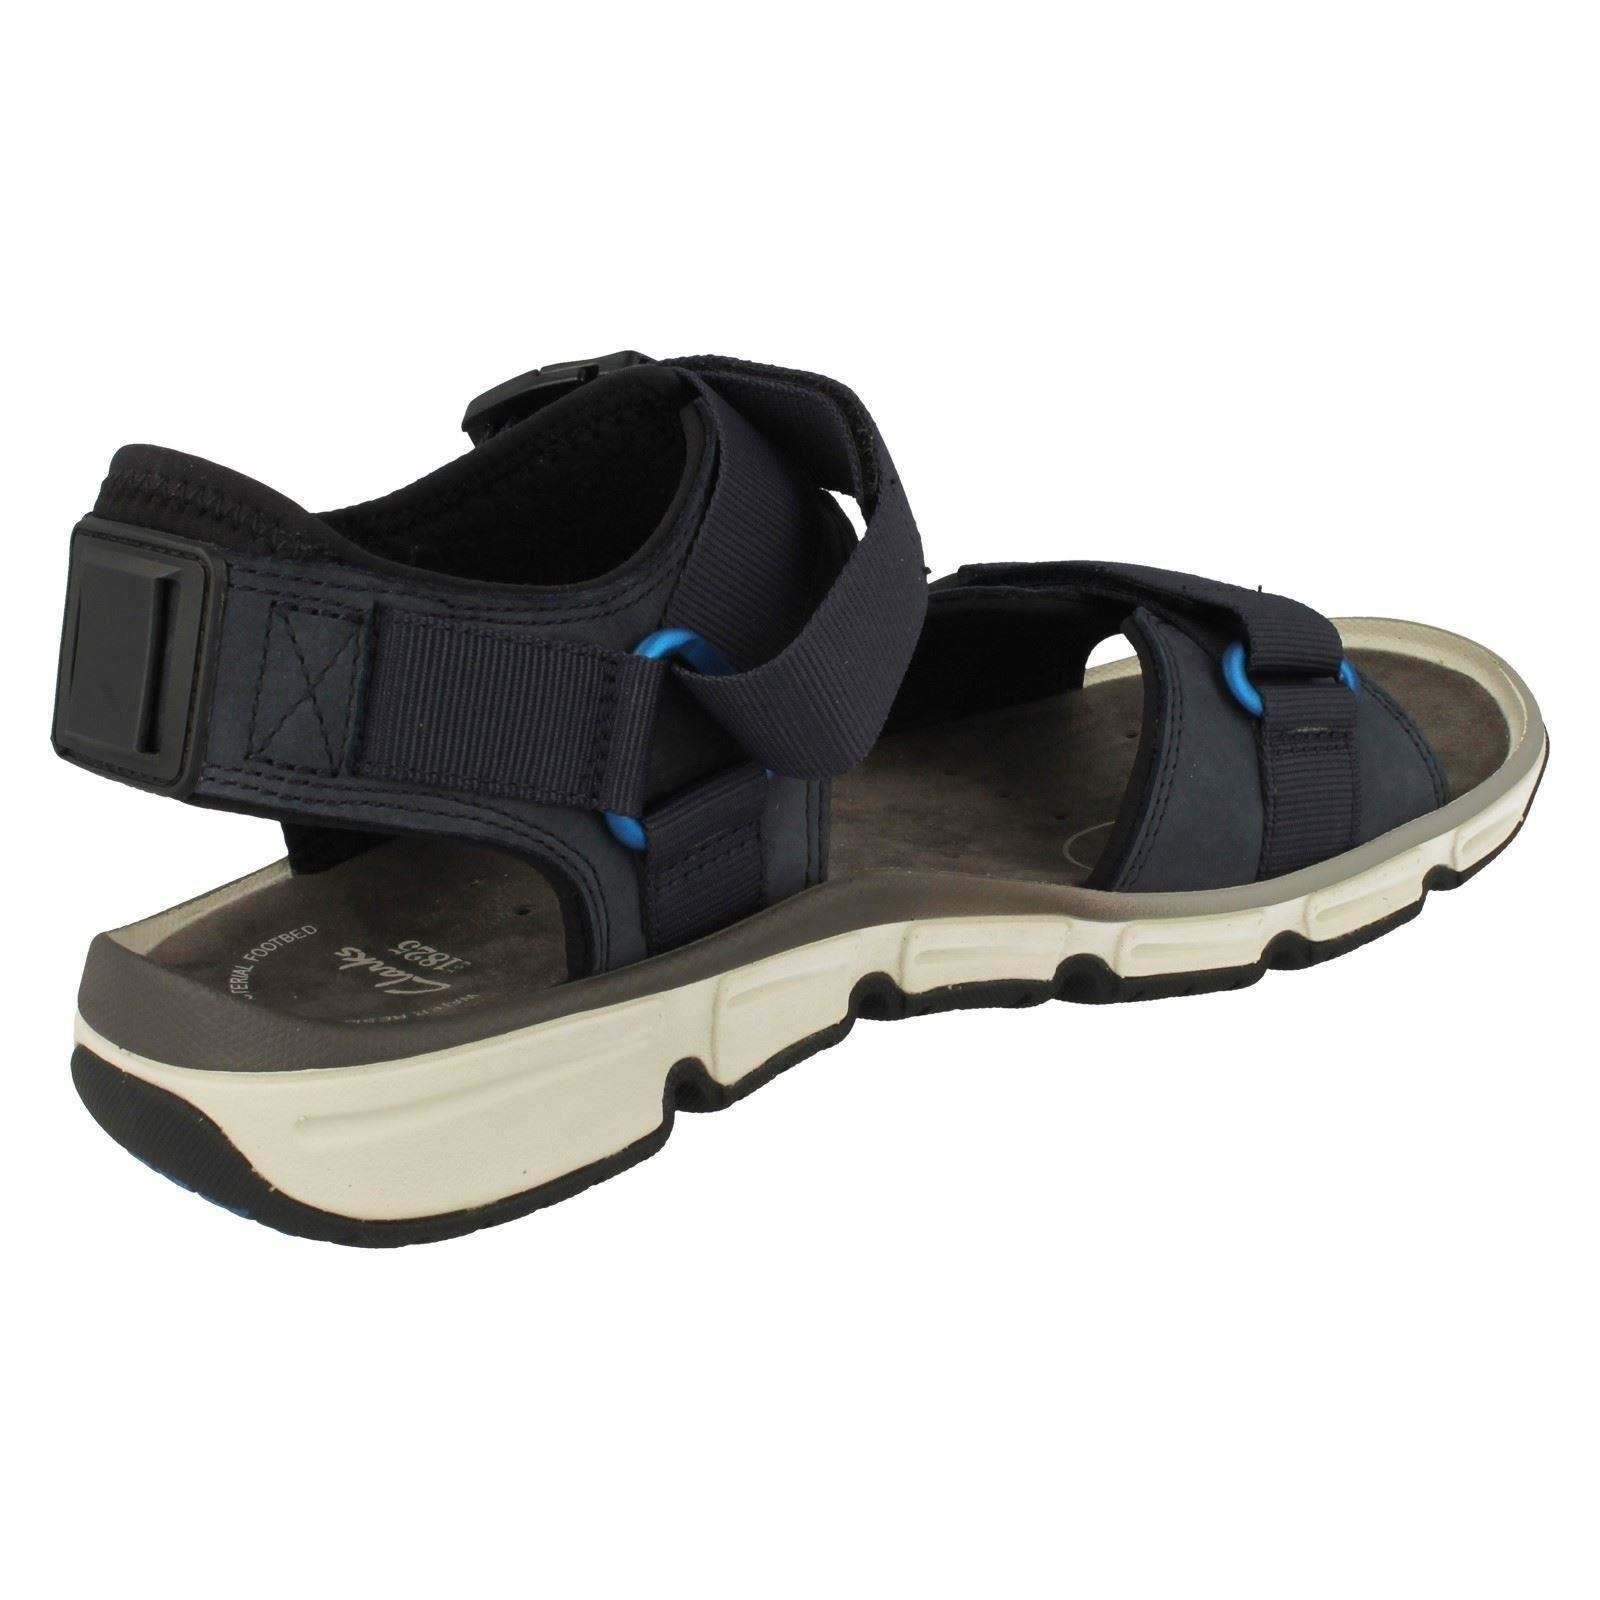 Mens Clarks Open Open Open Toe Summer Sandal Explore Part 7db465